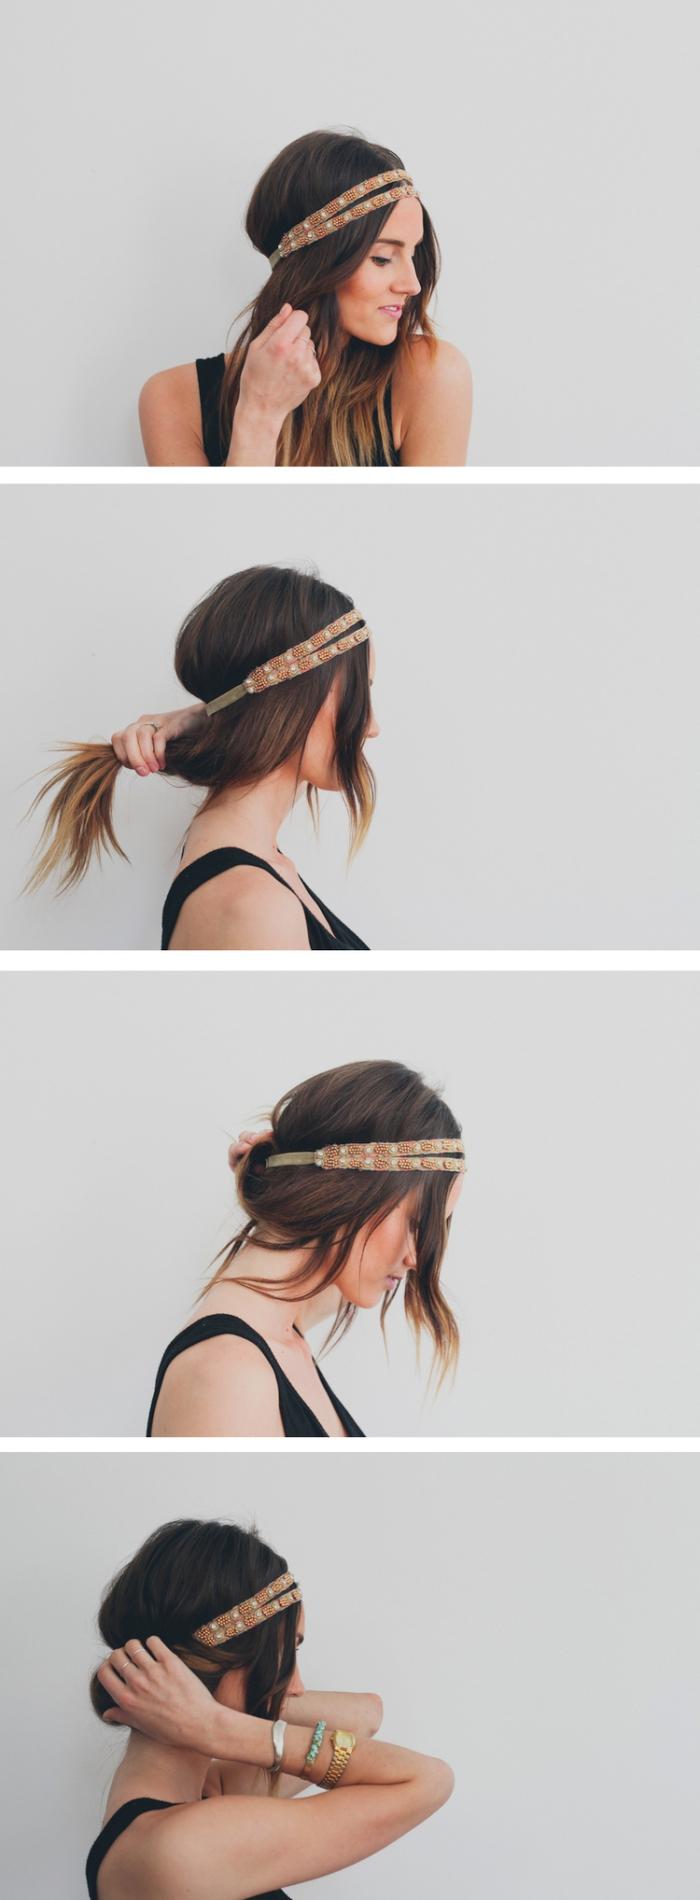 Coiffure femme headband